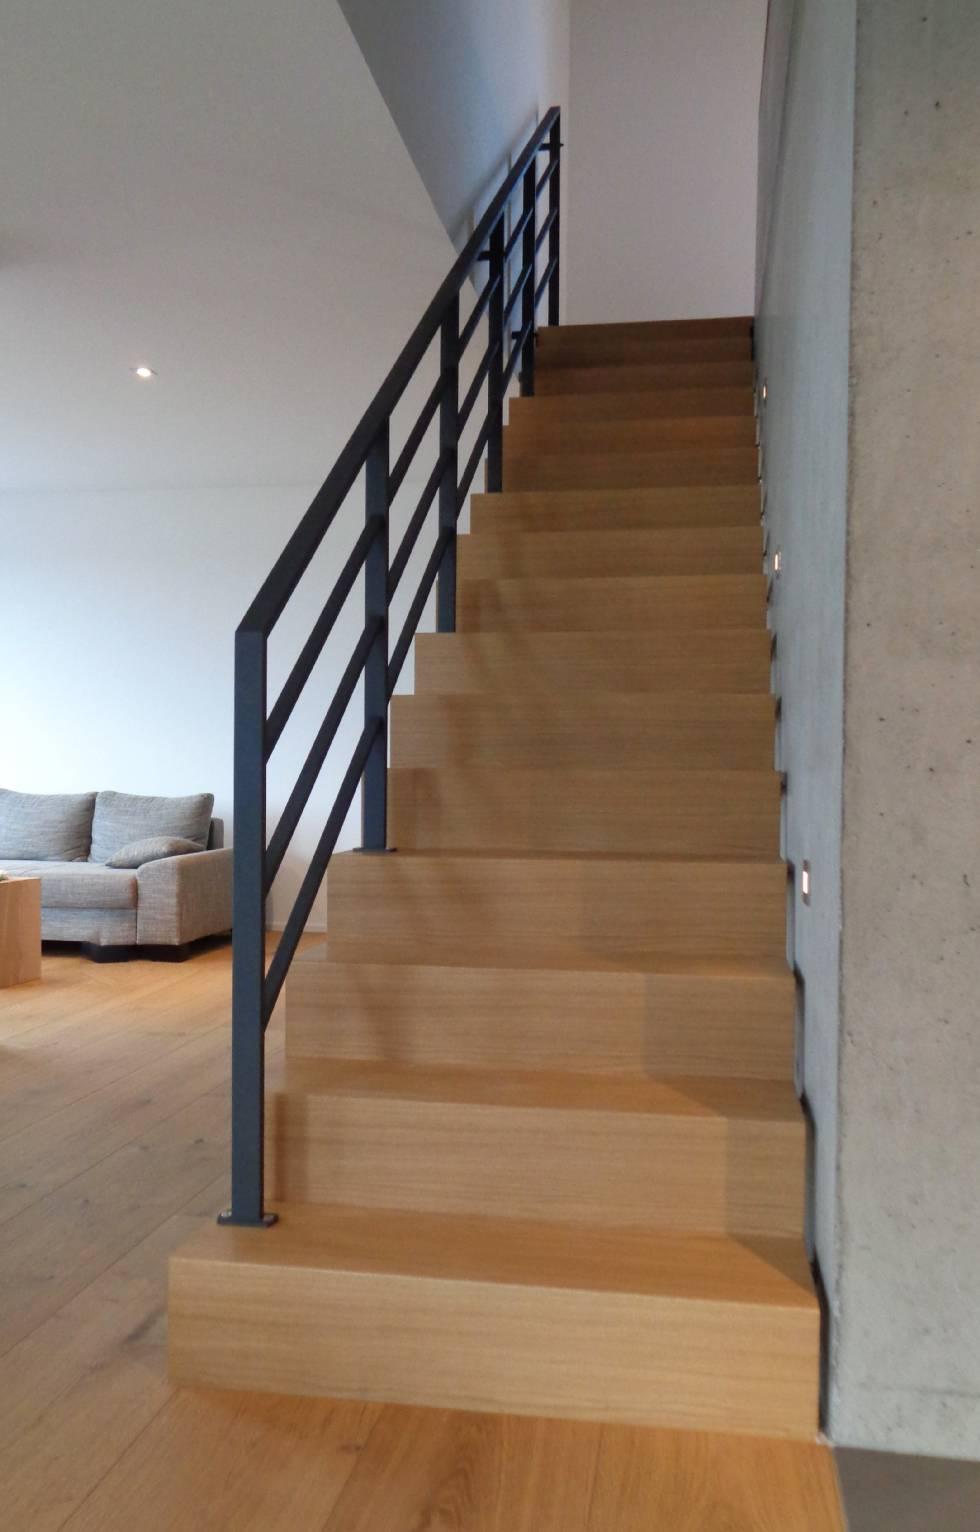 tr ber treppenbau und treppengel nder heilbronn treppen. Black Bedroom Furniture Sets. Home Design Ideas